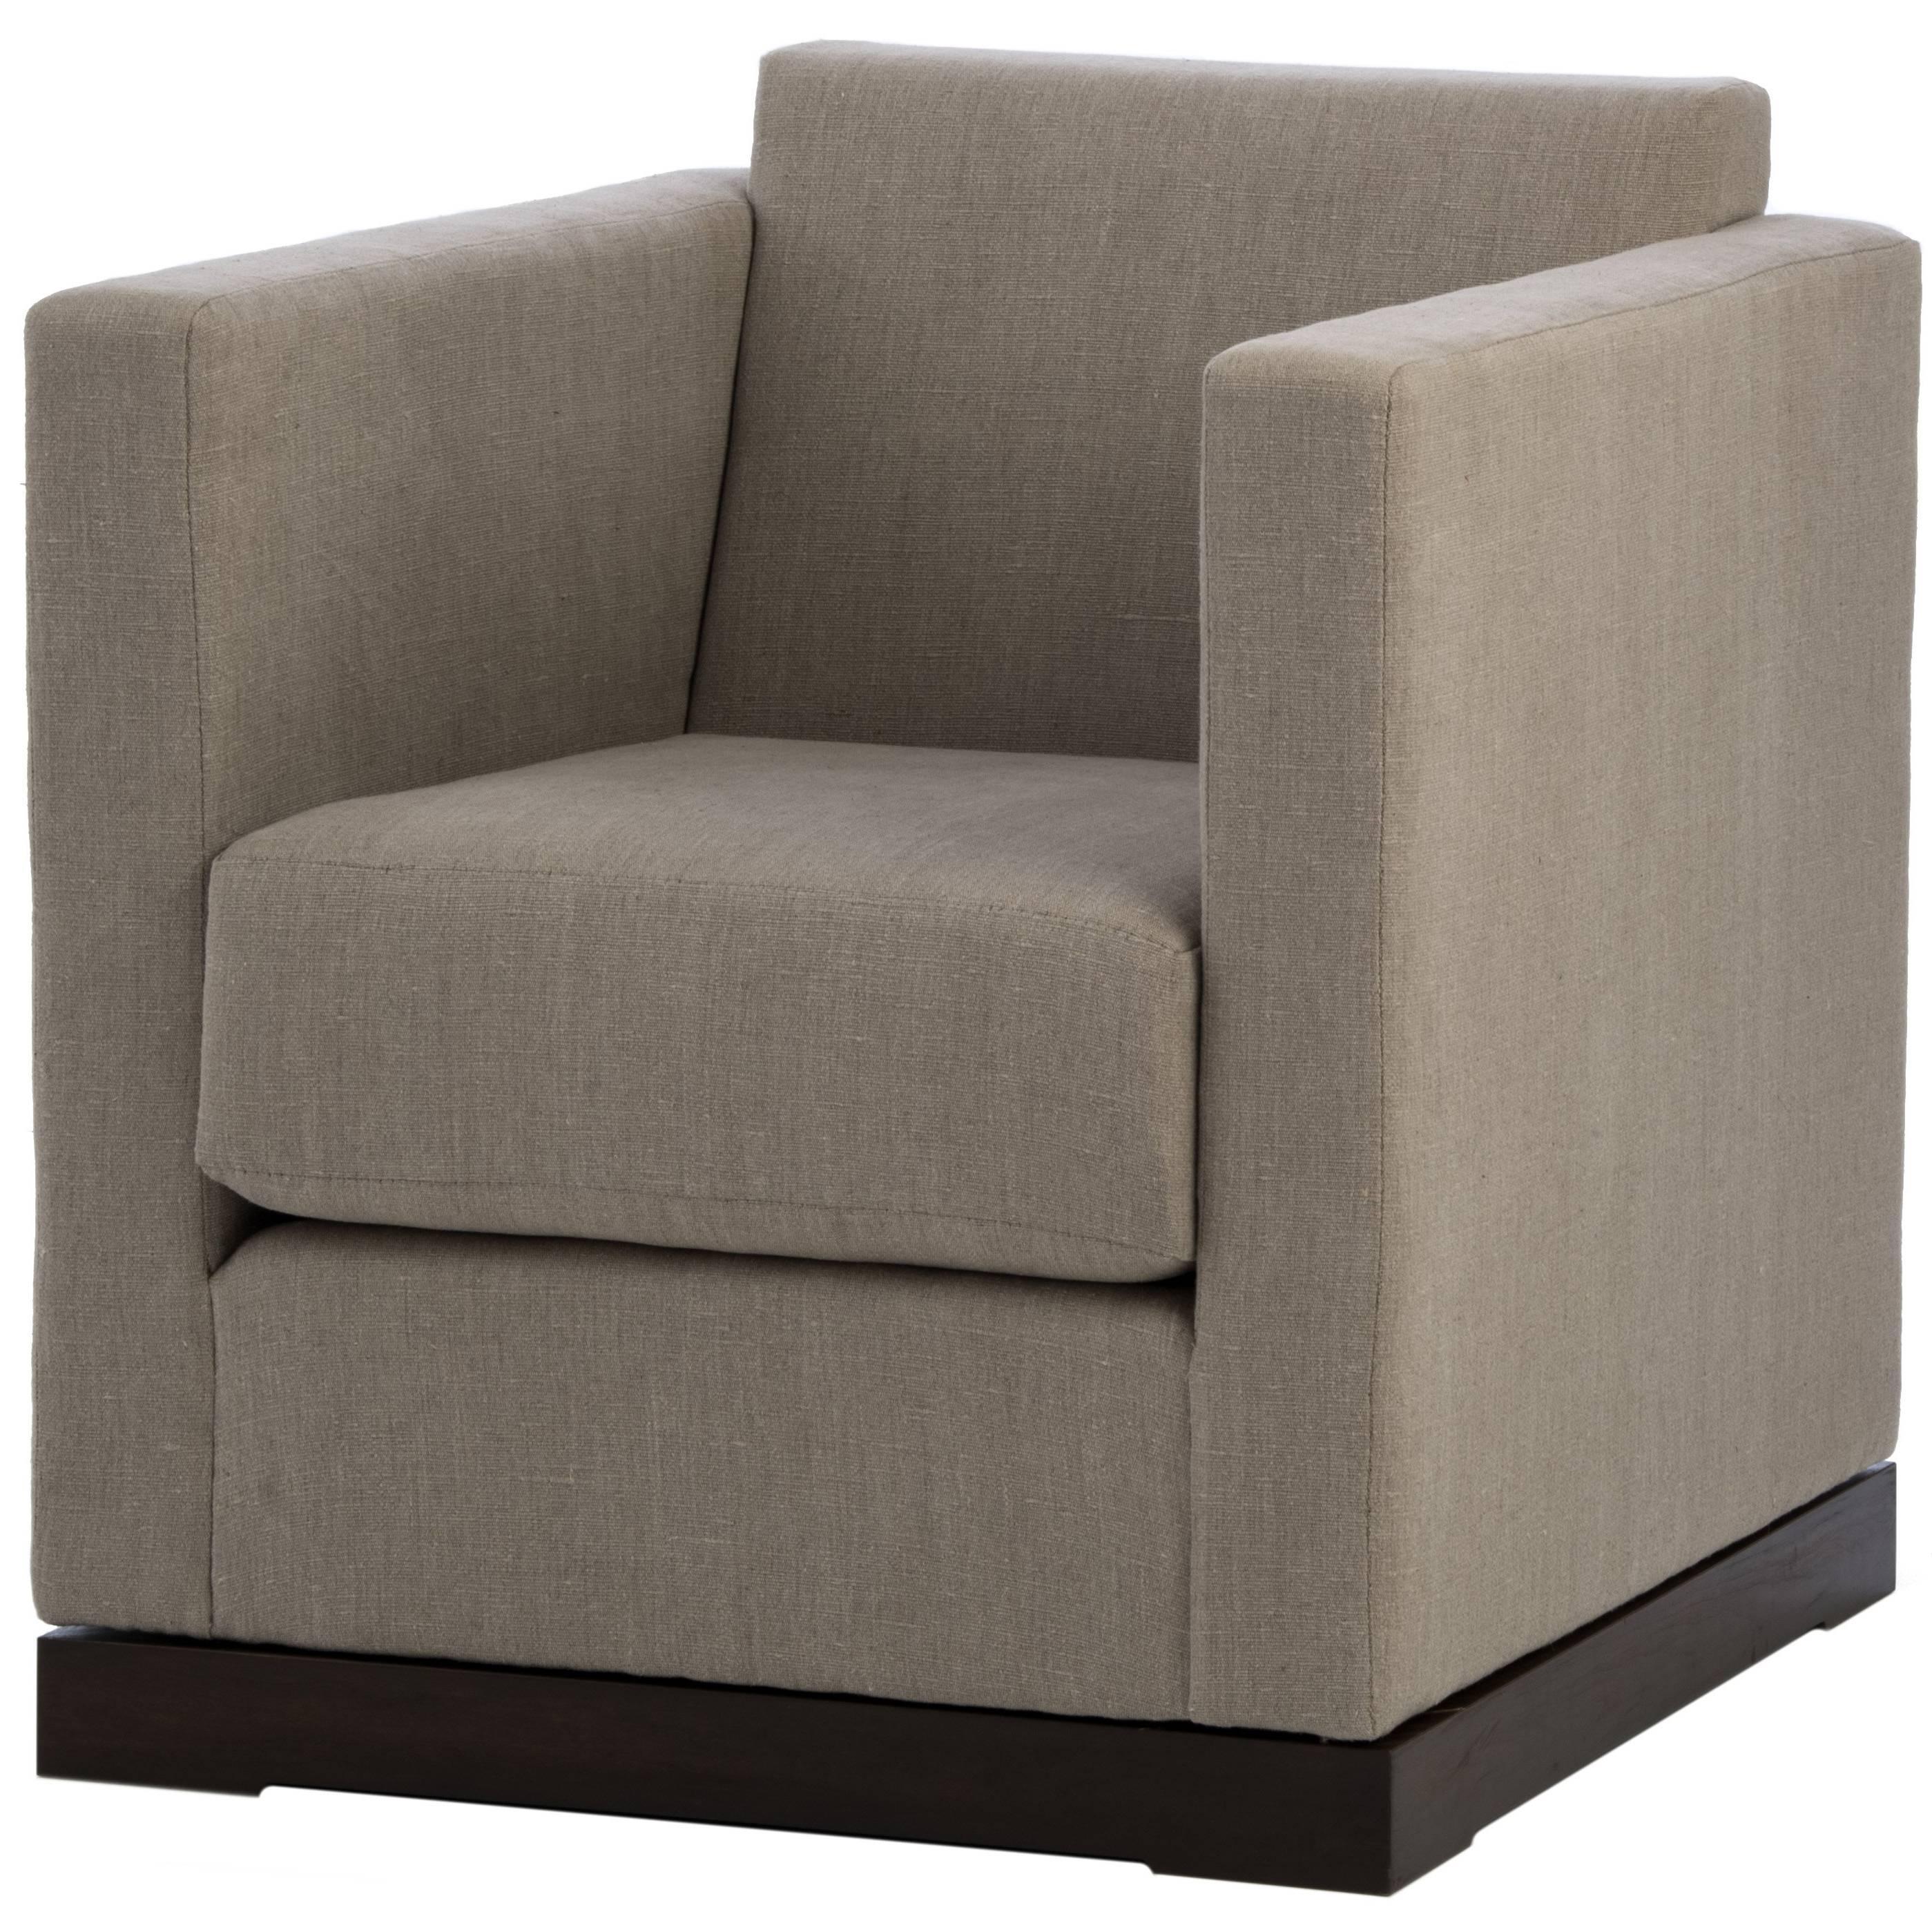 Ralph Swivel Club Chair